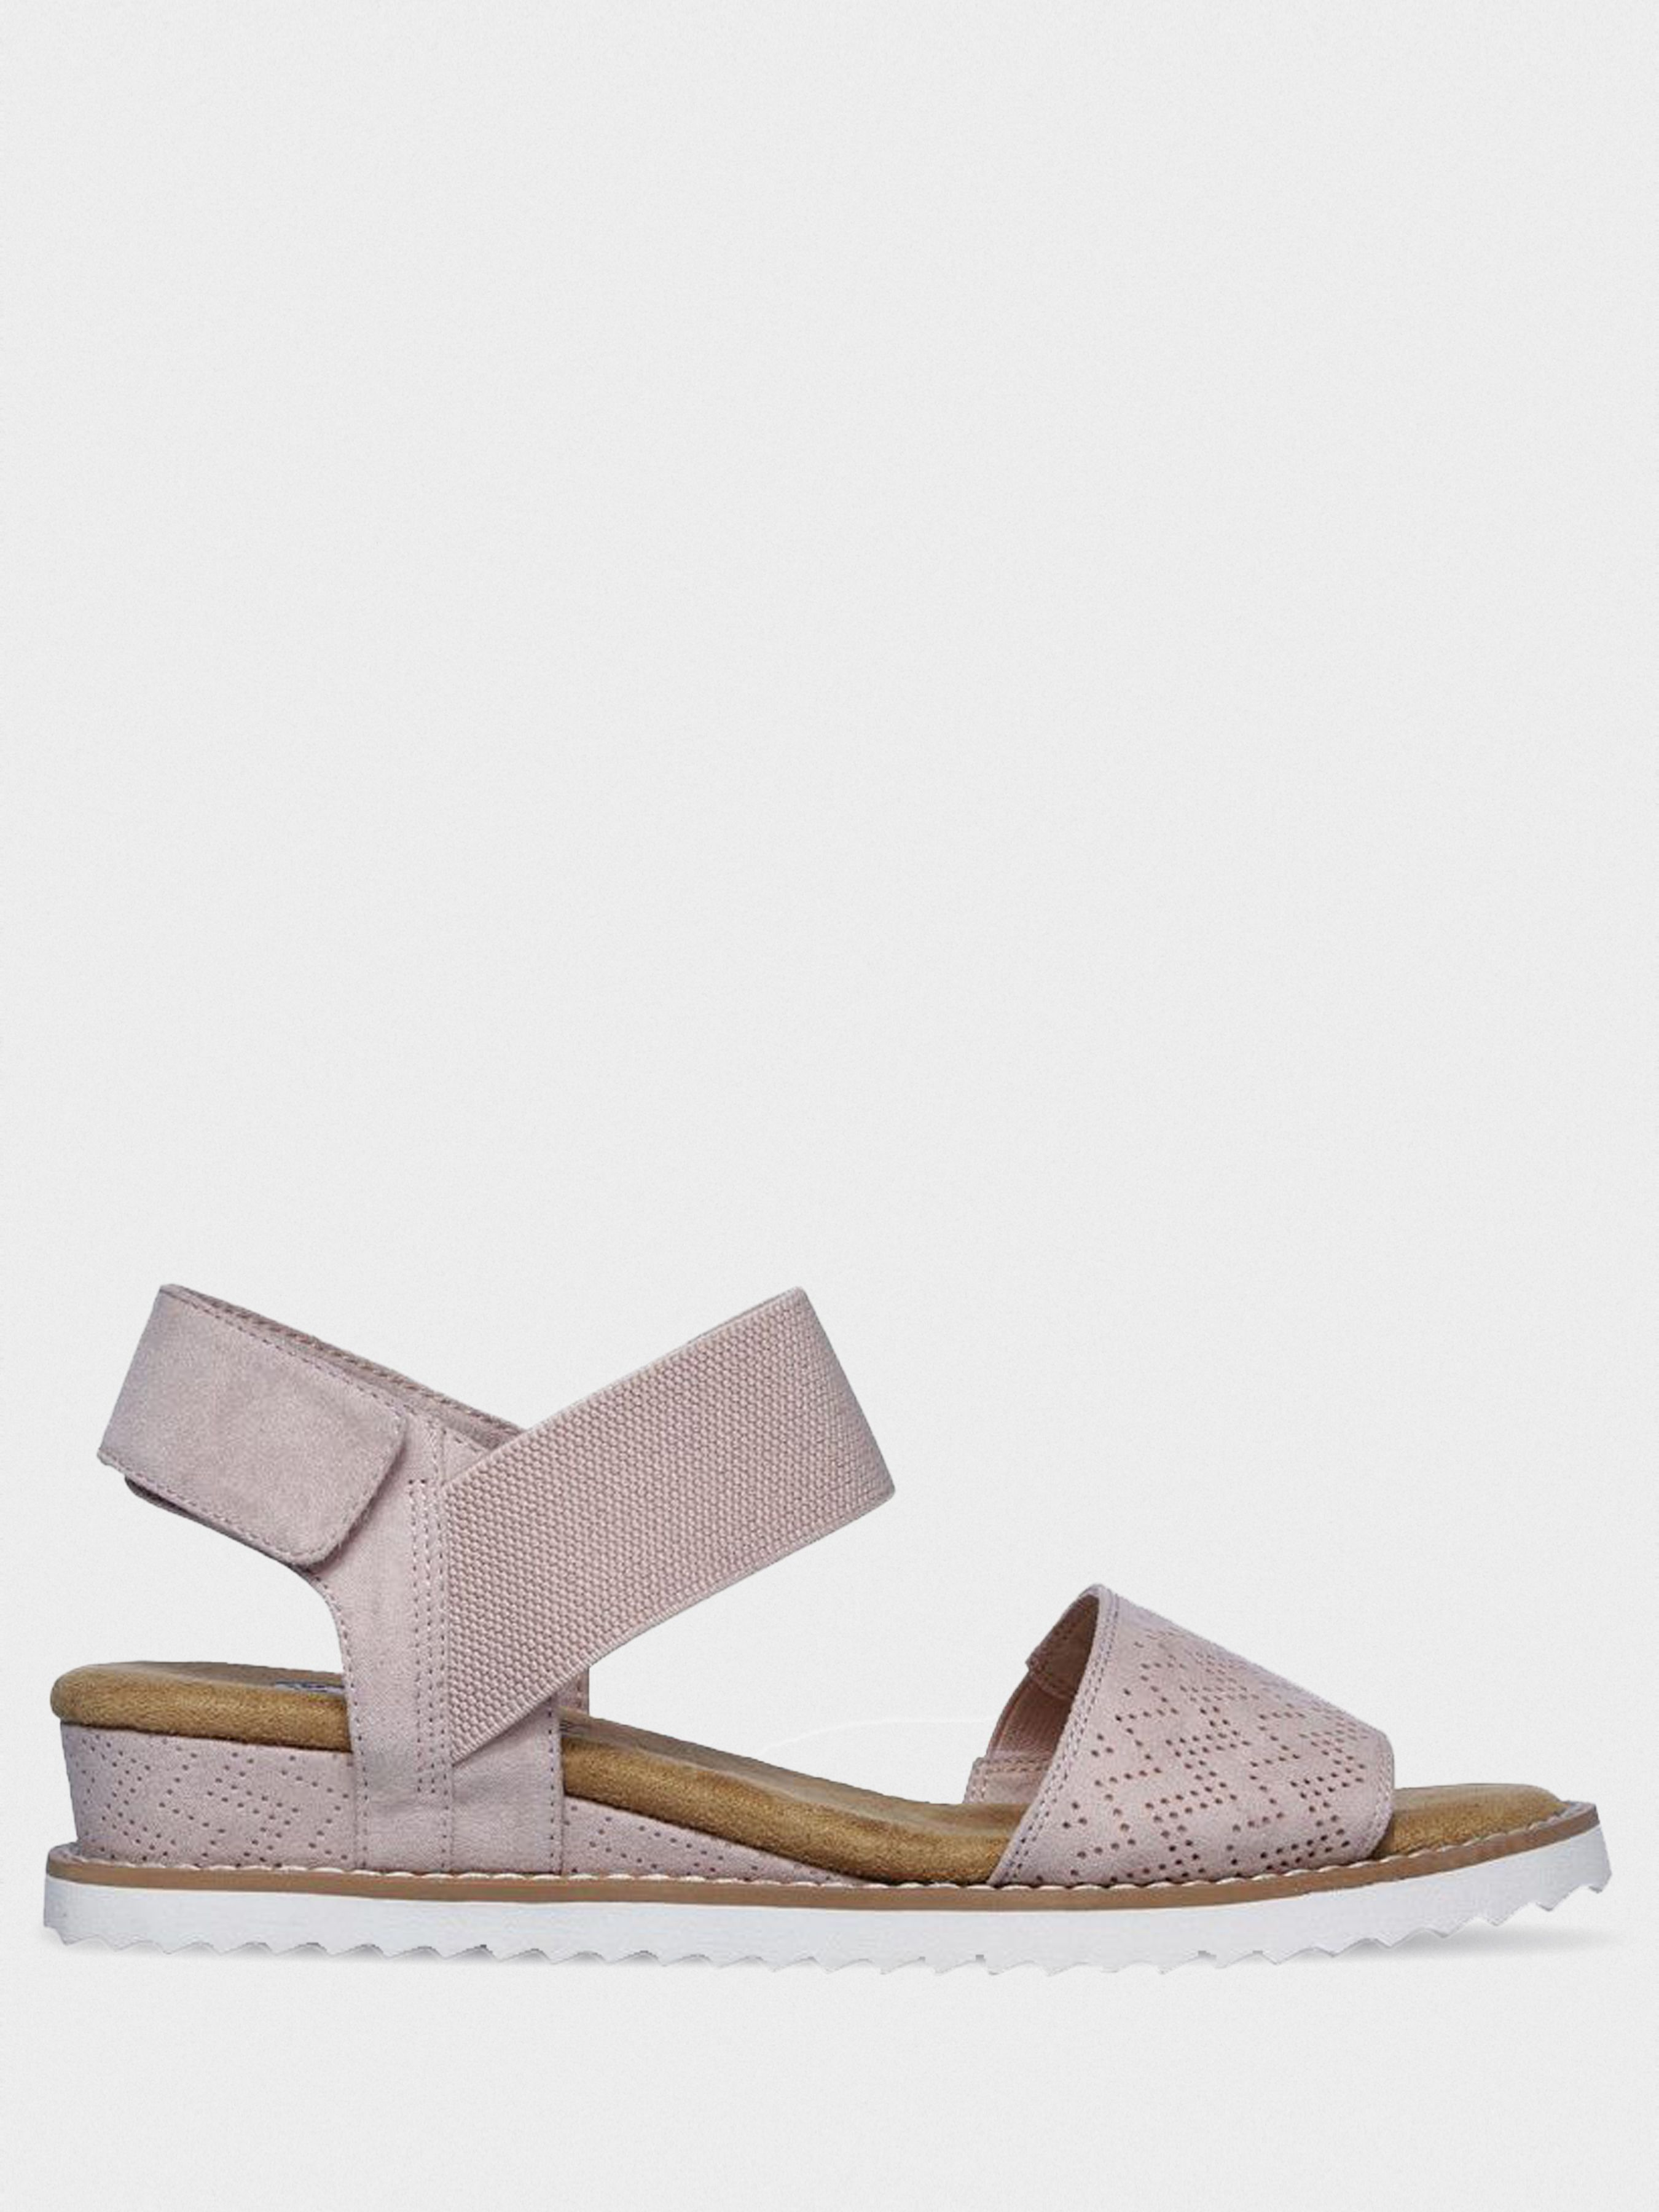 Сандалии для женщин Skechers KW5049 размеры обуви, 2017